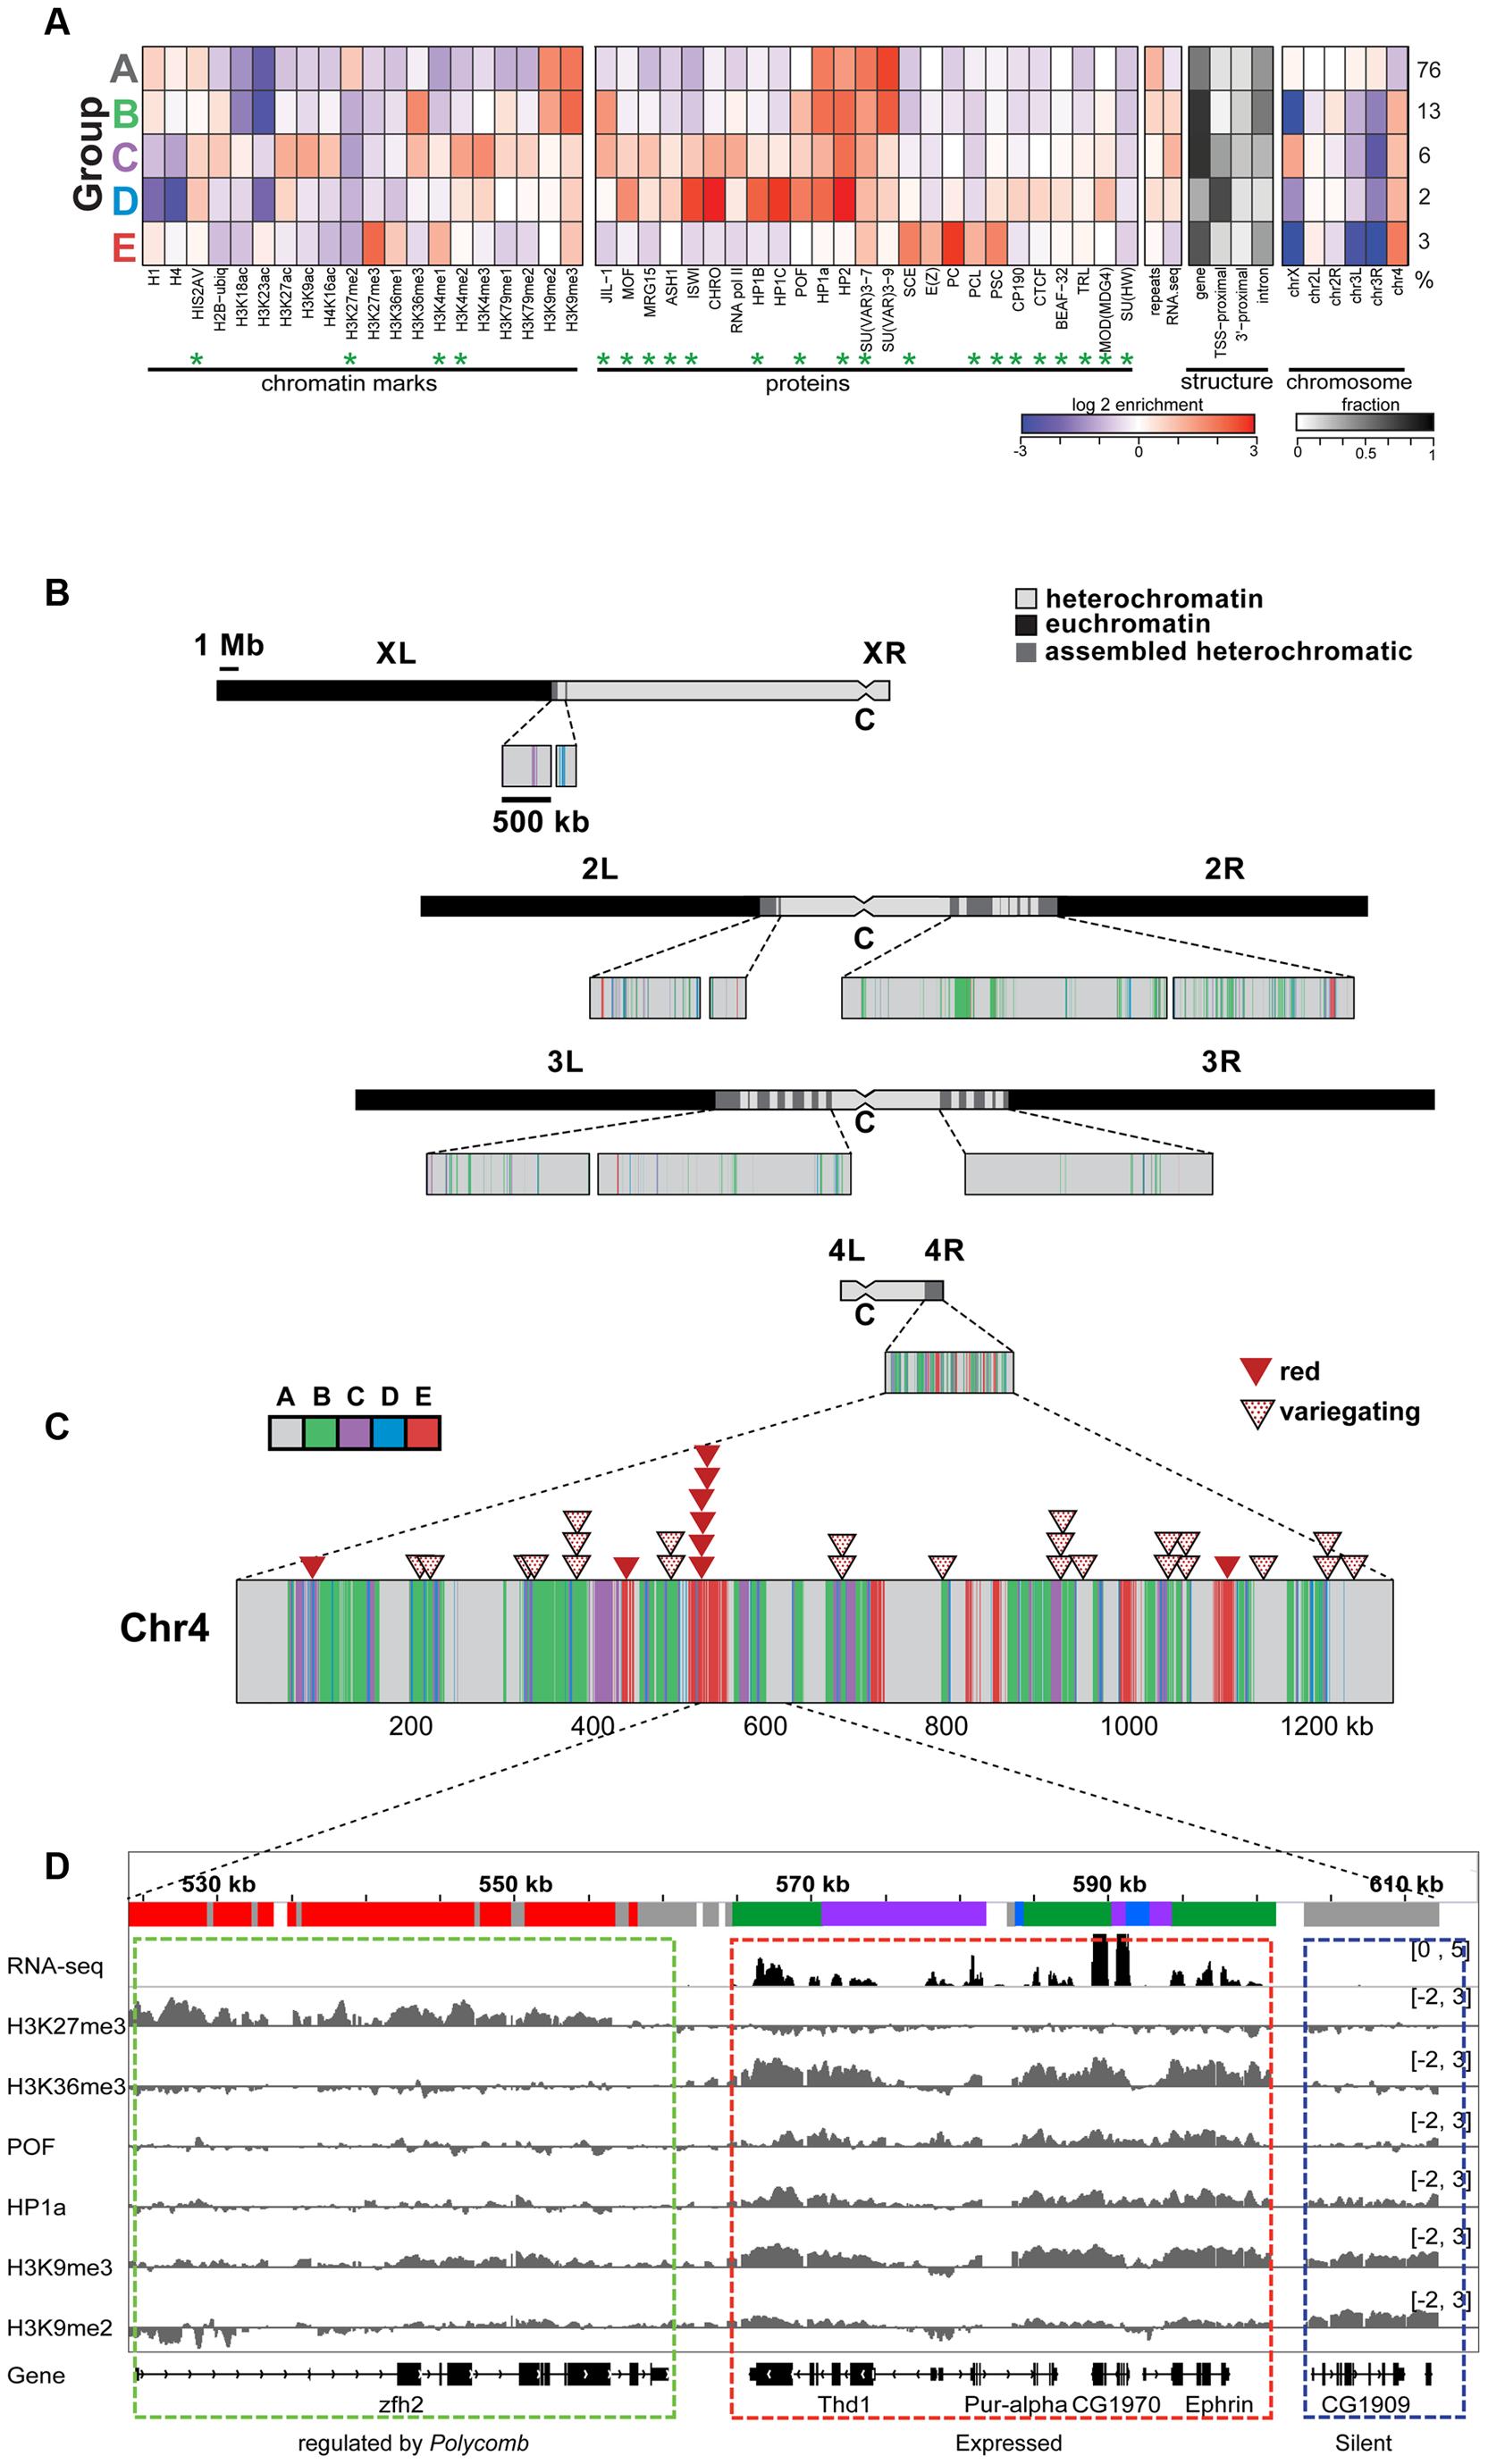 The chromatin composition of <i>D. melanogaster</i> chromosome 4 shows distinct patterns of enrichment.